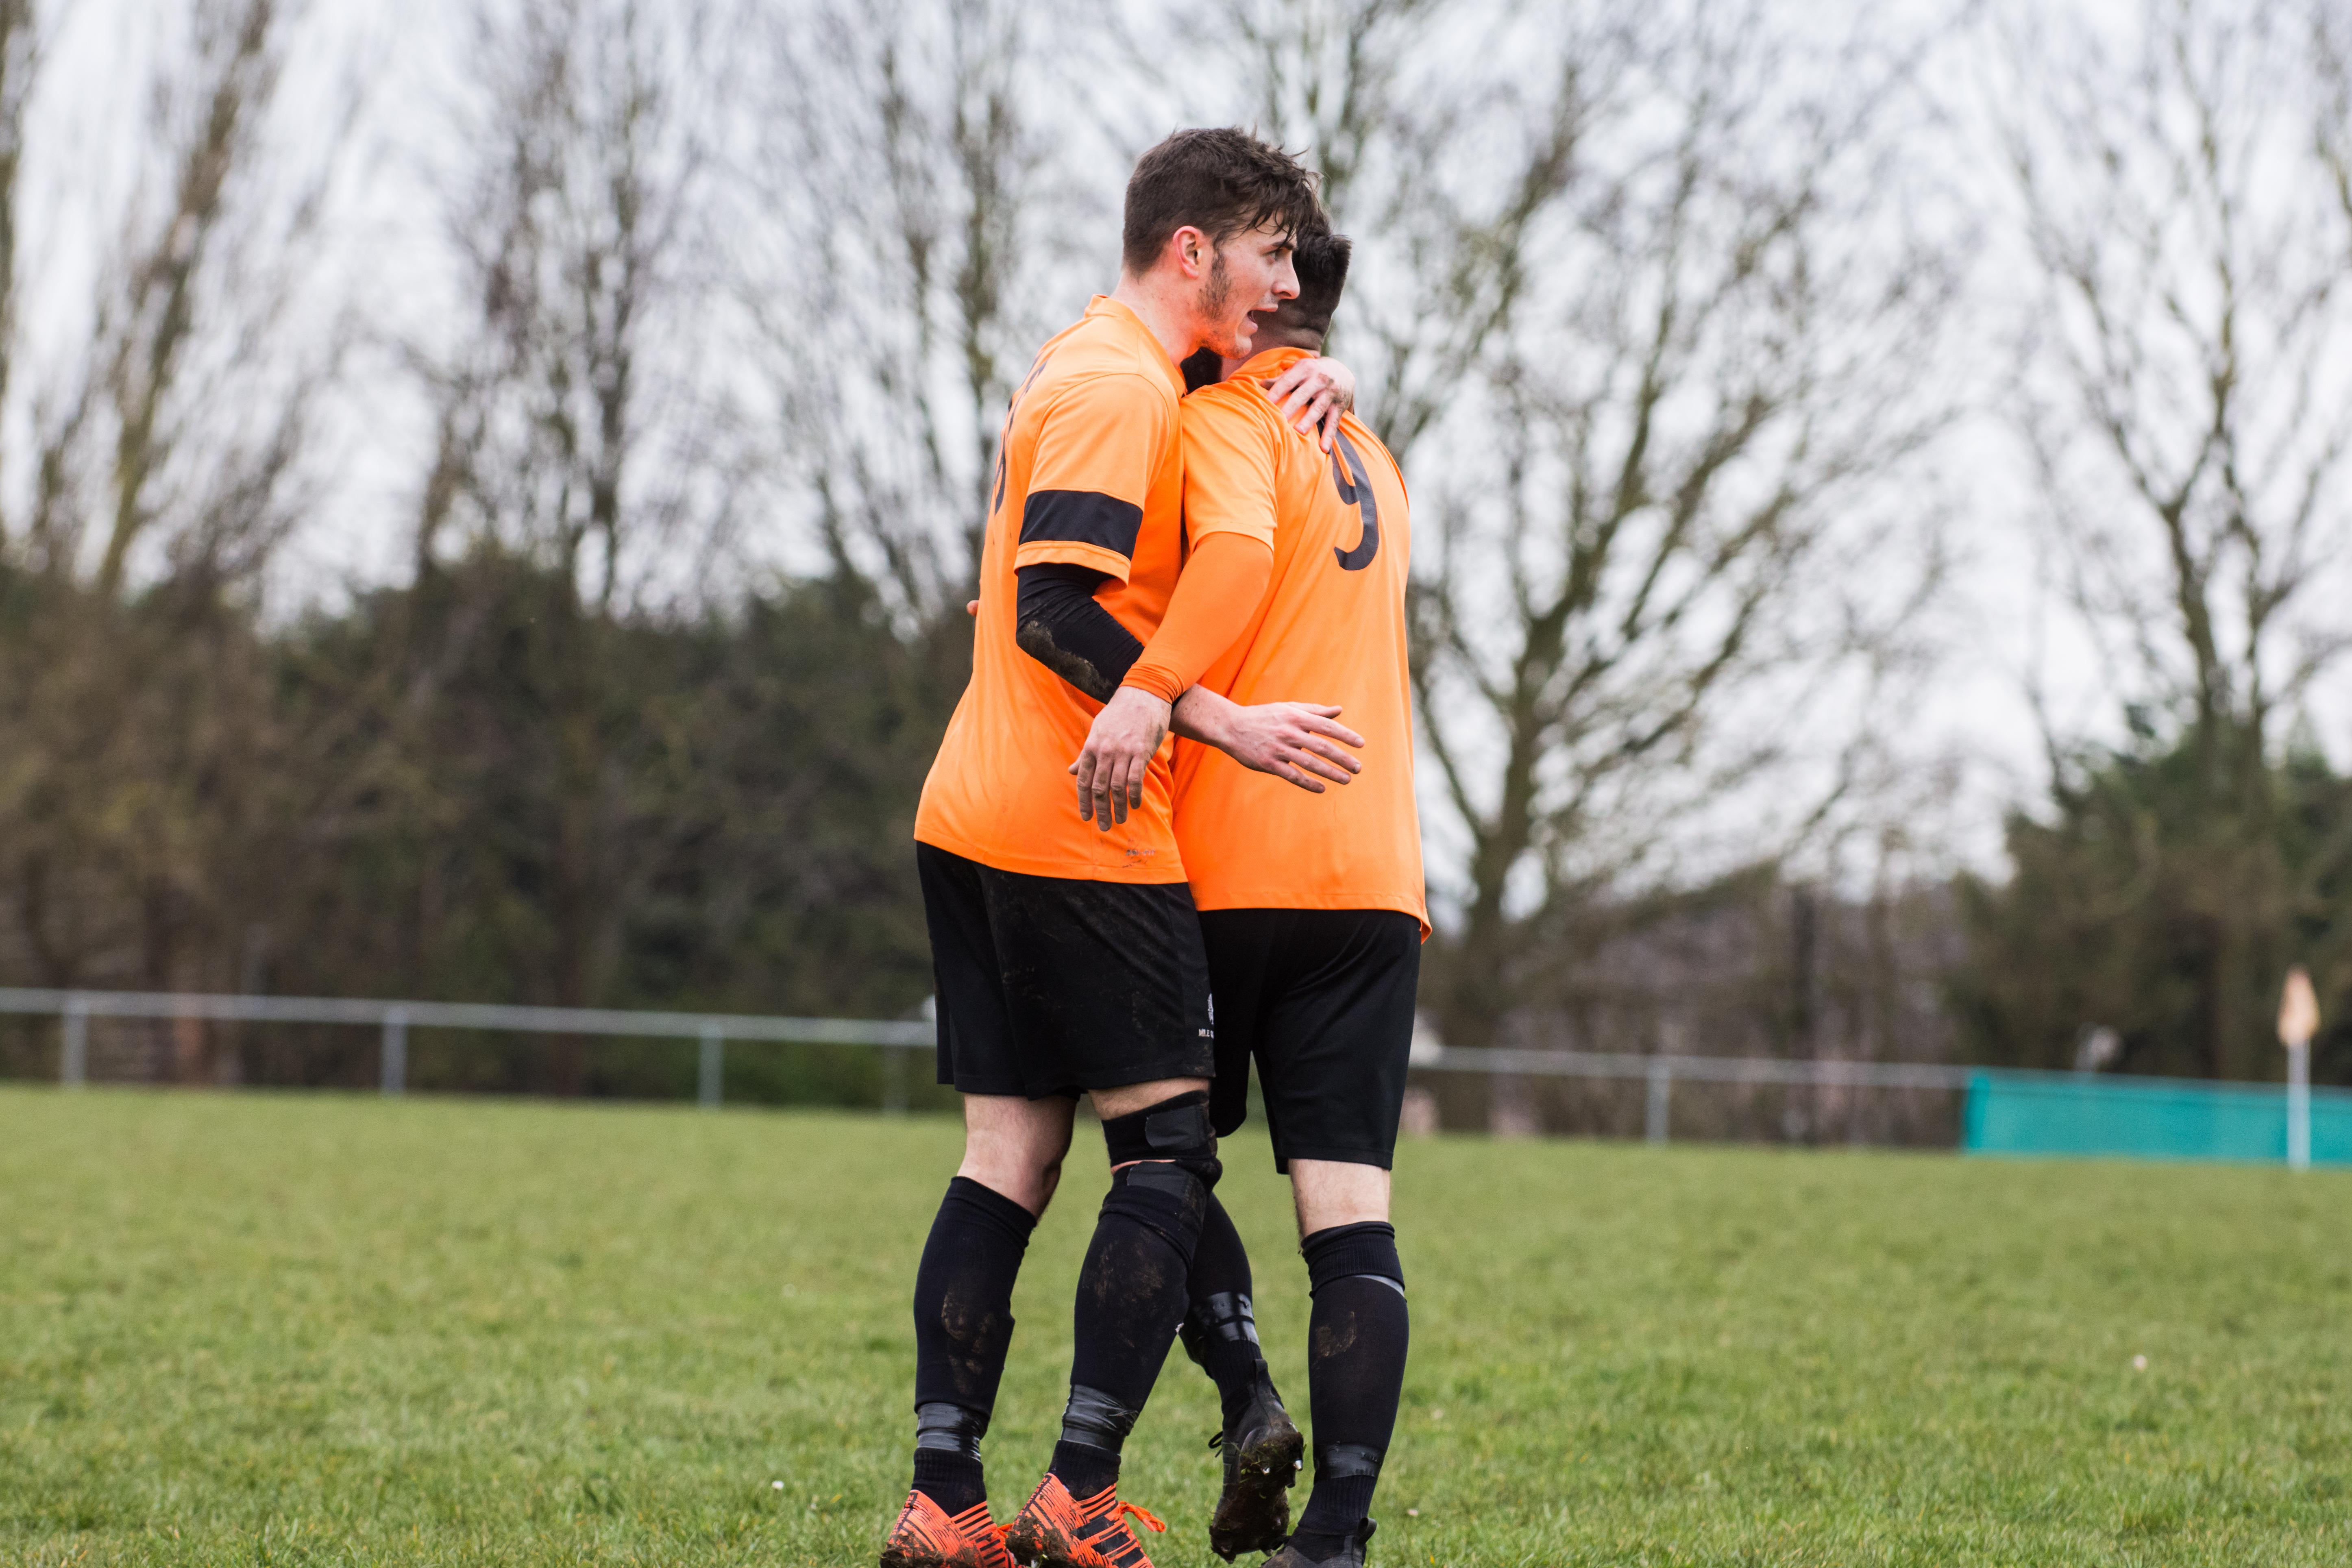 DAVID_JEFFERY Mile Oak FC vs Hailsham Town FC 24.03.18 31